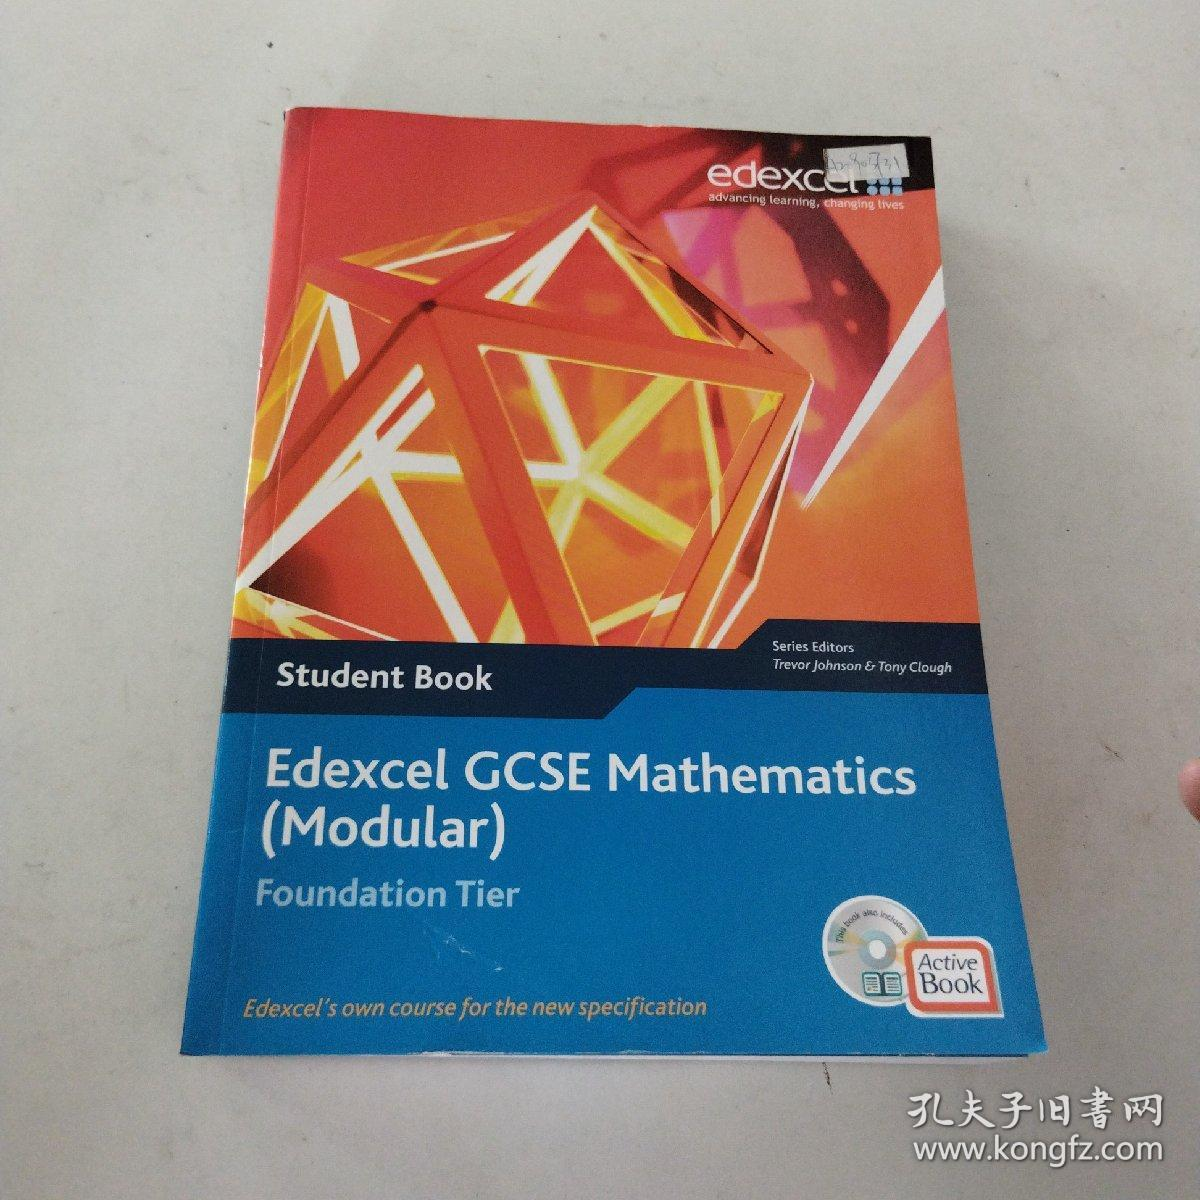 【外文原版】Edexcel GCSE Mathematics